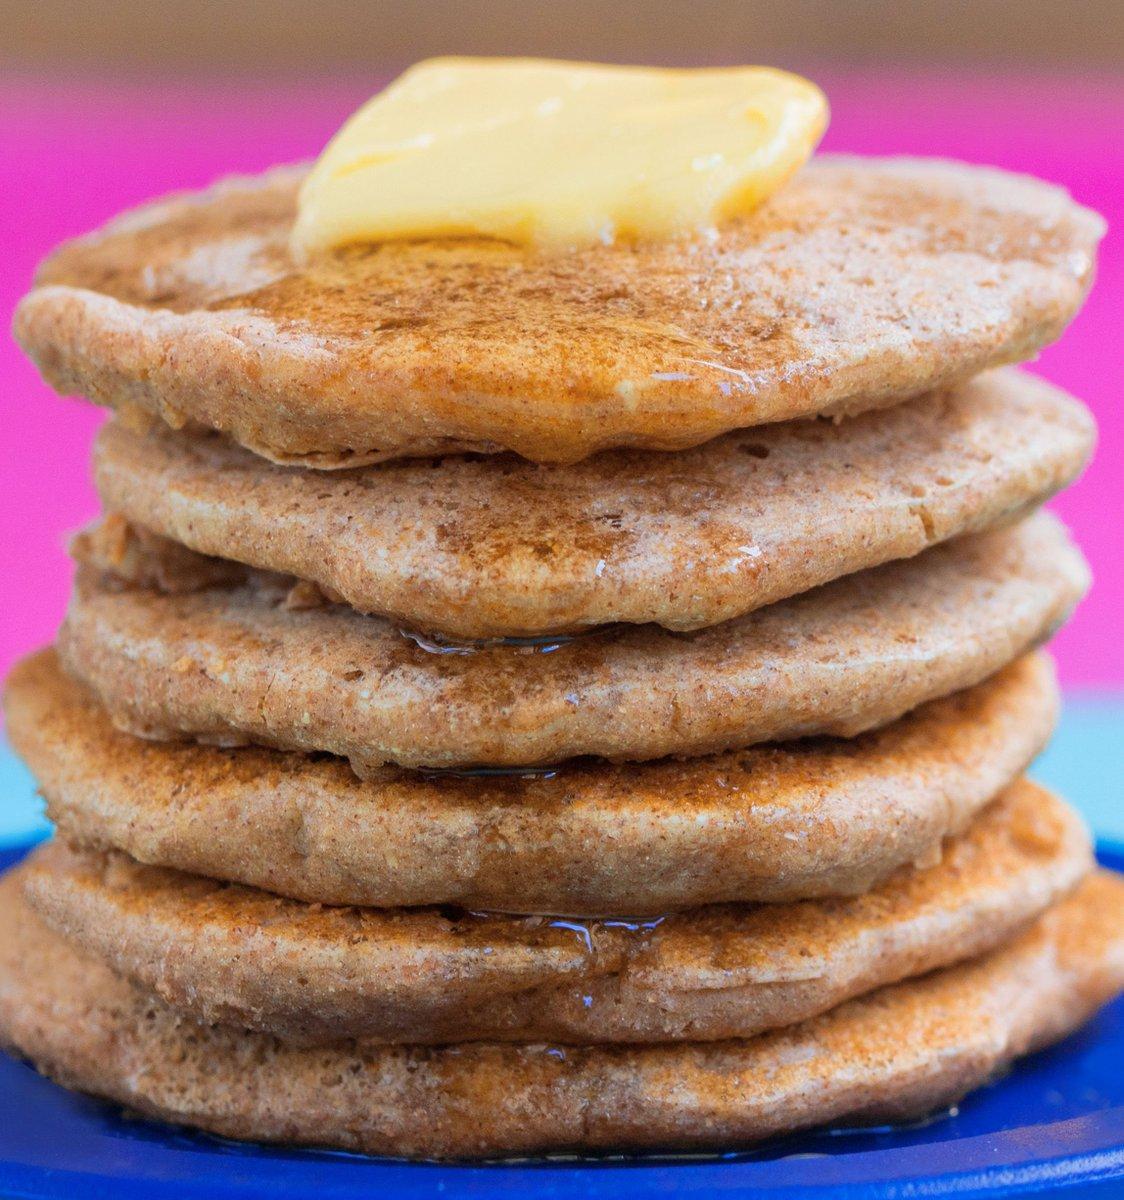 Chocolatecoverkatie on twitter how to make sure your pancakes dgurbprwaau5av2g ccuart Gallery